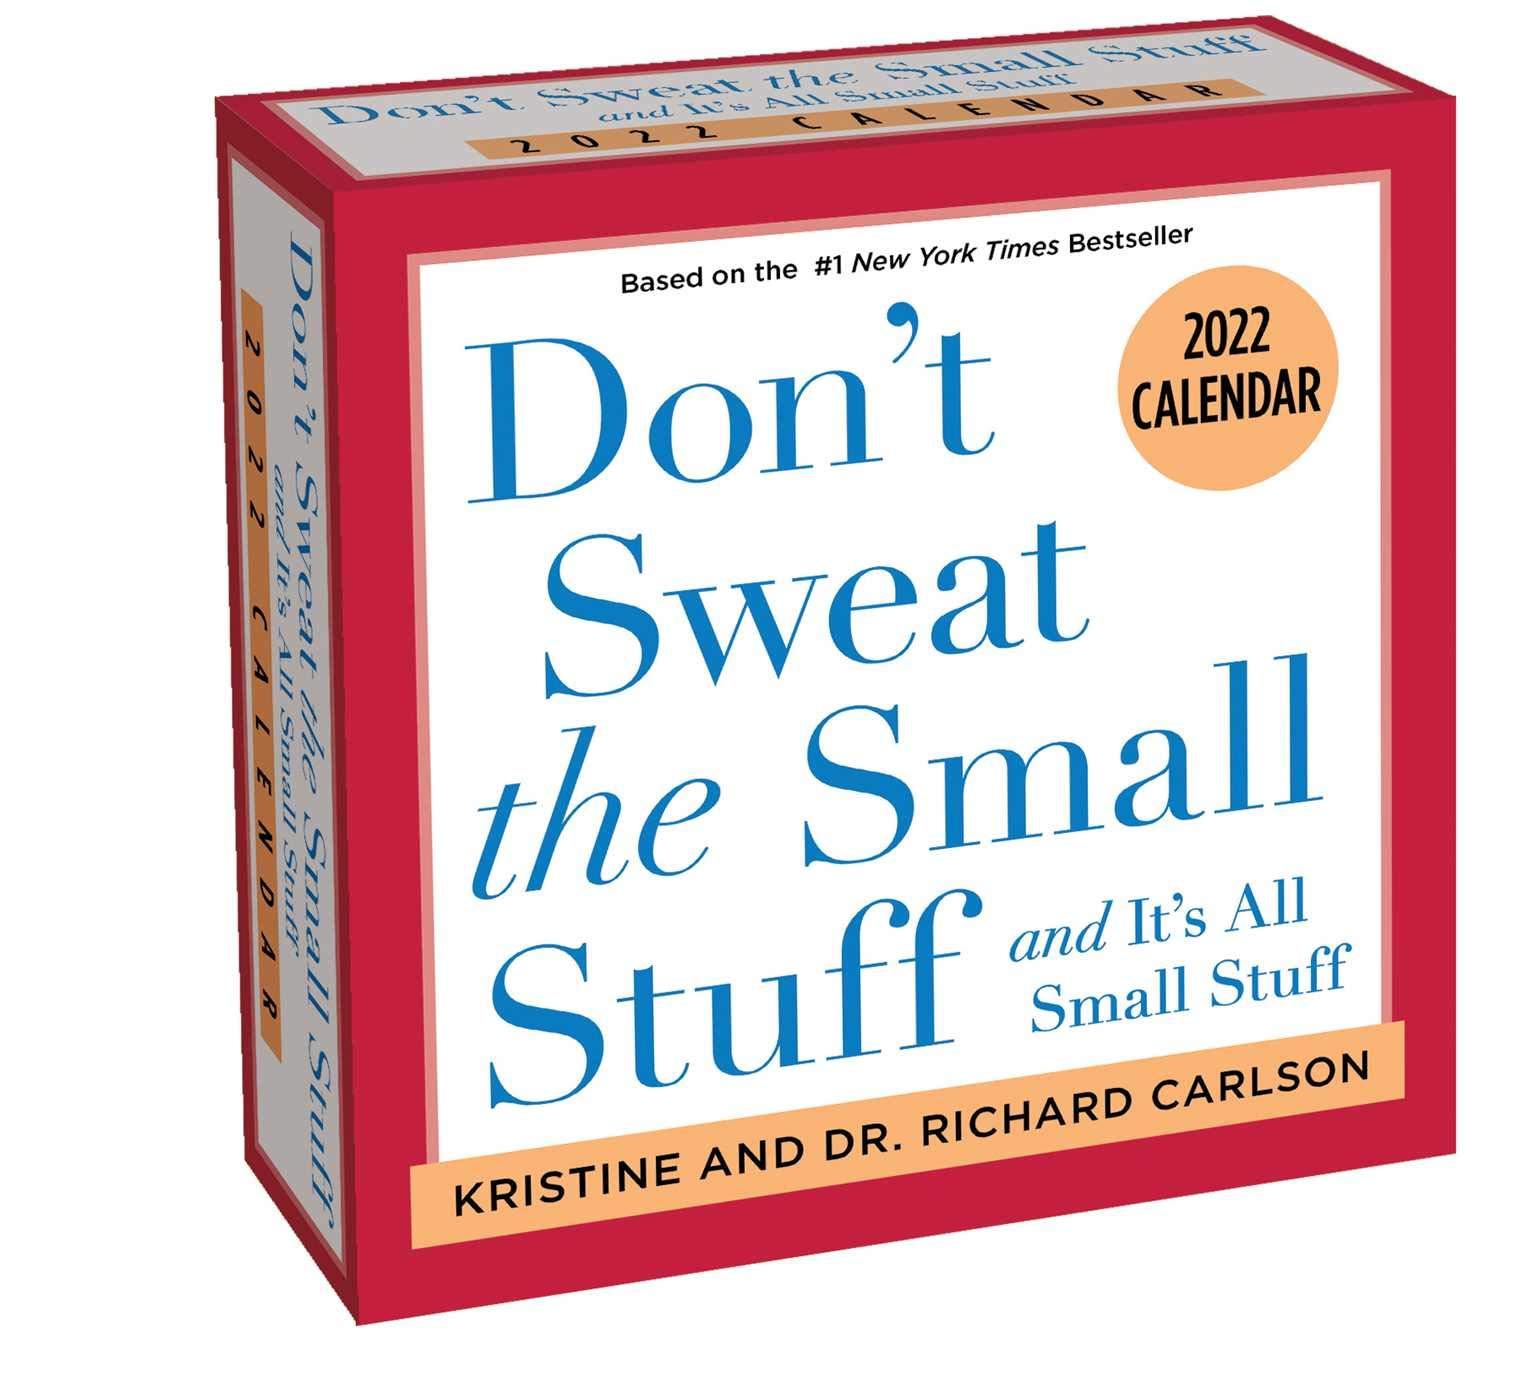 2022 Small Calendar.Don T Sweat The Small Stuff 2022 Day To Day Calendar Amazon In Carlson Richard Carlson Kristine Books